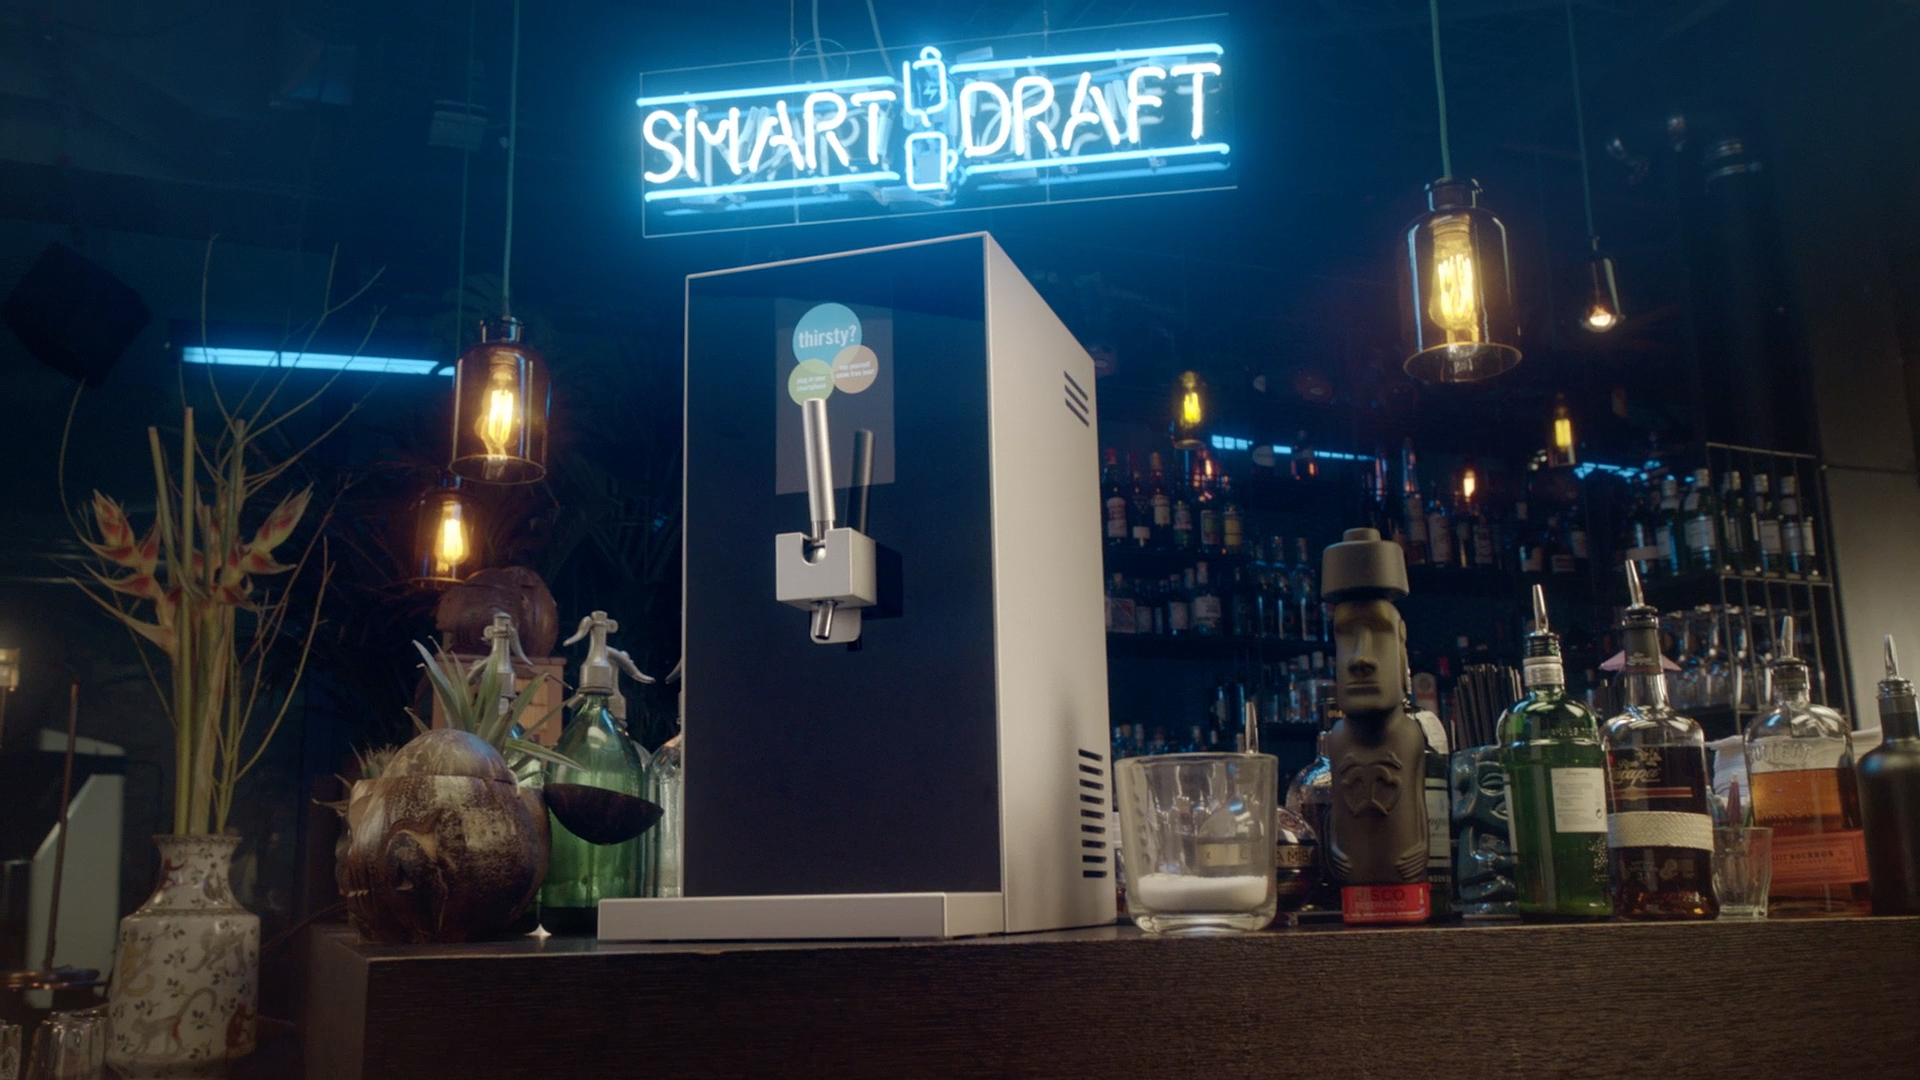 strobel_martin_smartdraft_02